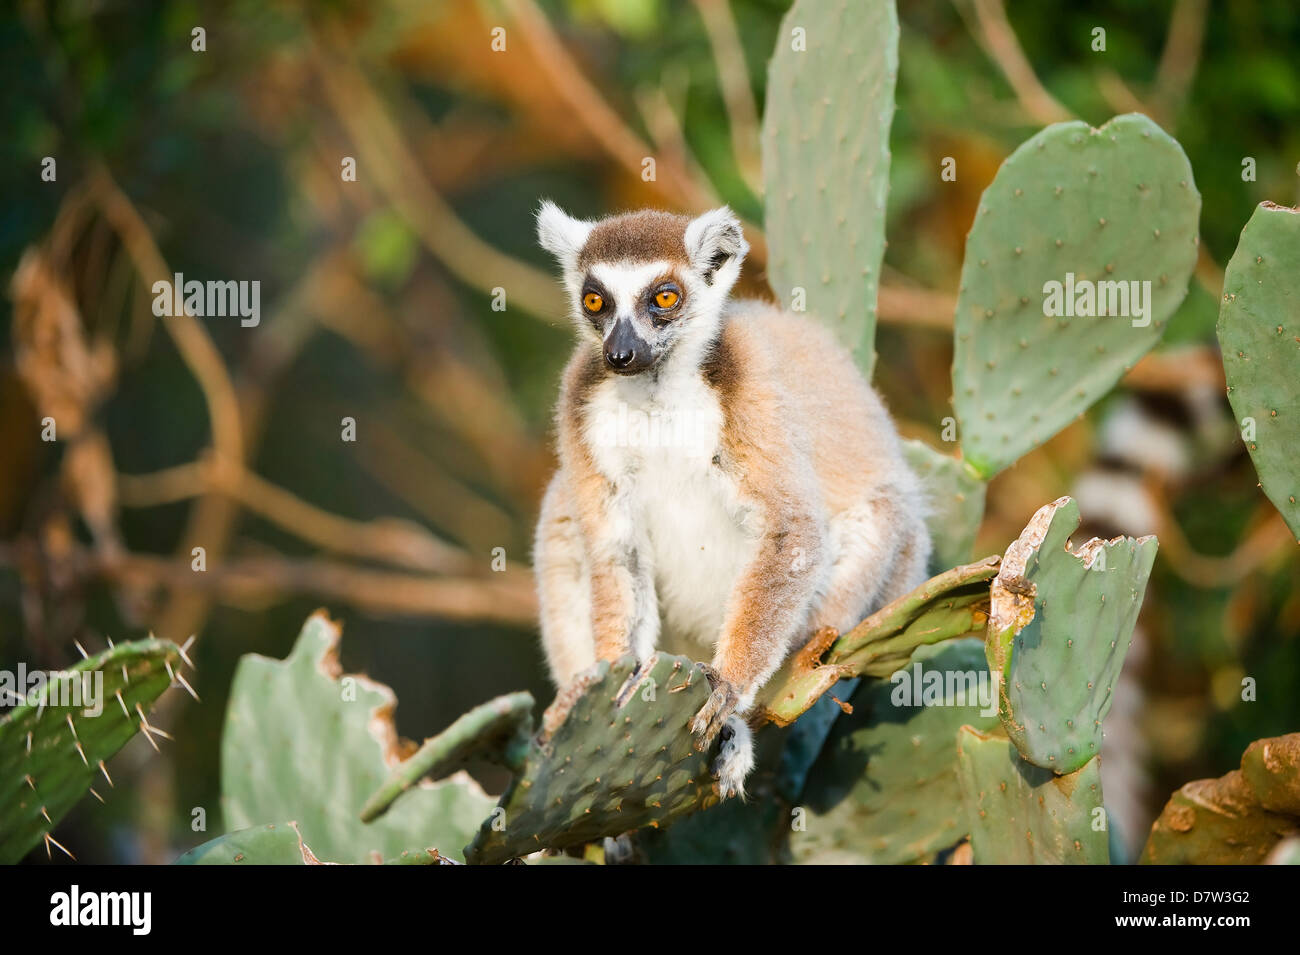 Ring-tailed lemur (Lemur catta) on cactus, near Threatened, Berenty Nature Reserve, Madagascar - Stock Image